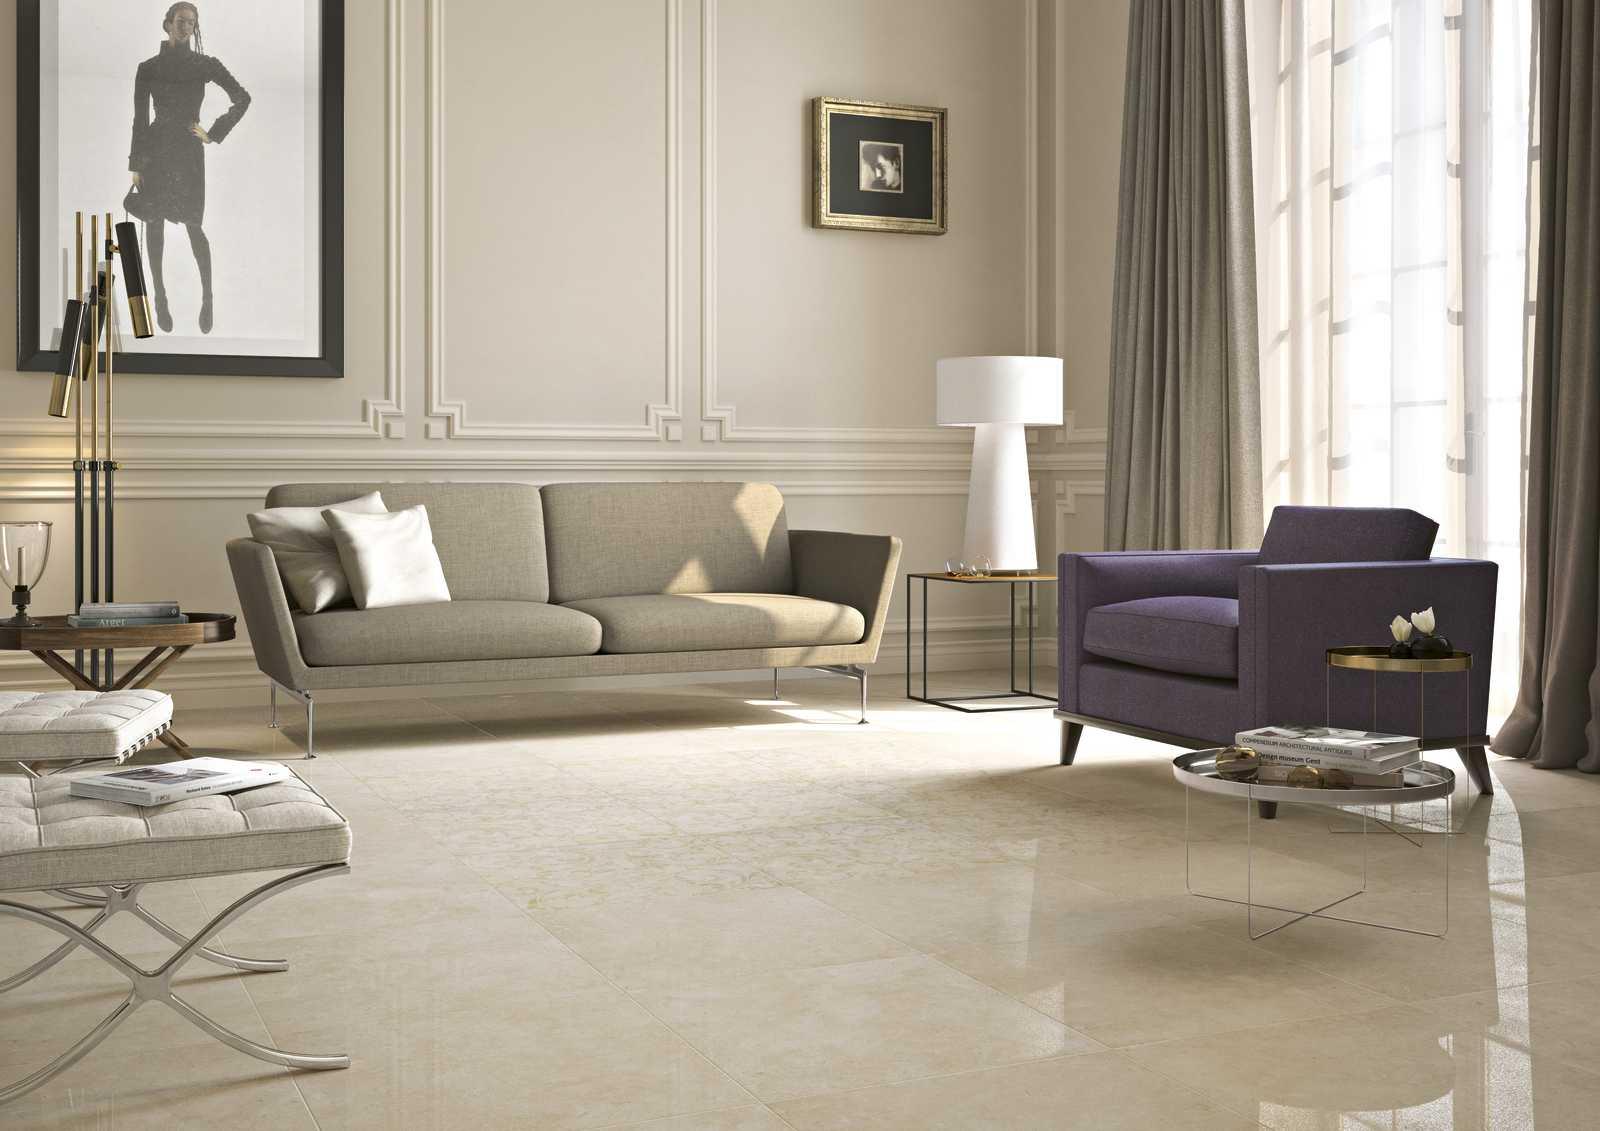 Pietra di noto porcelain stoneware flooring marazzi pietra di noto ceramic tiles marazzi4214 dailygadgetfo Choice Image